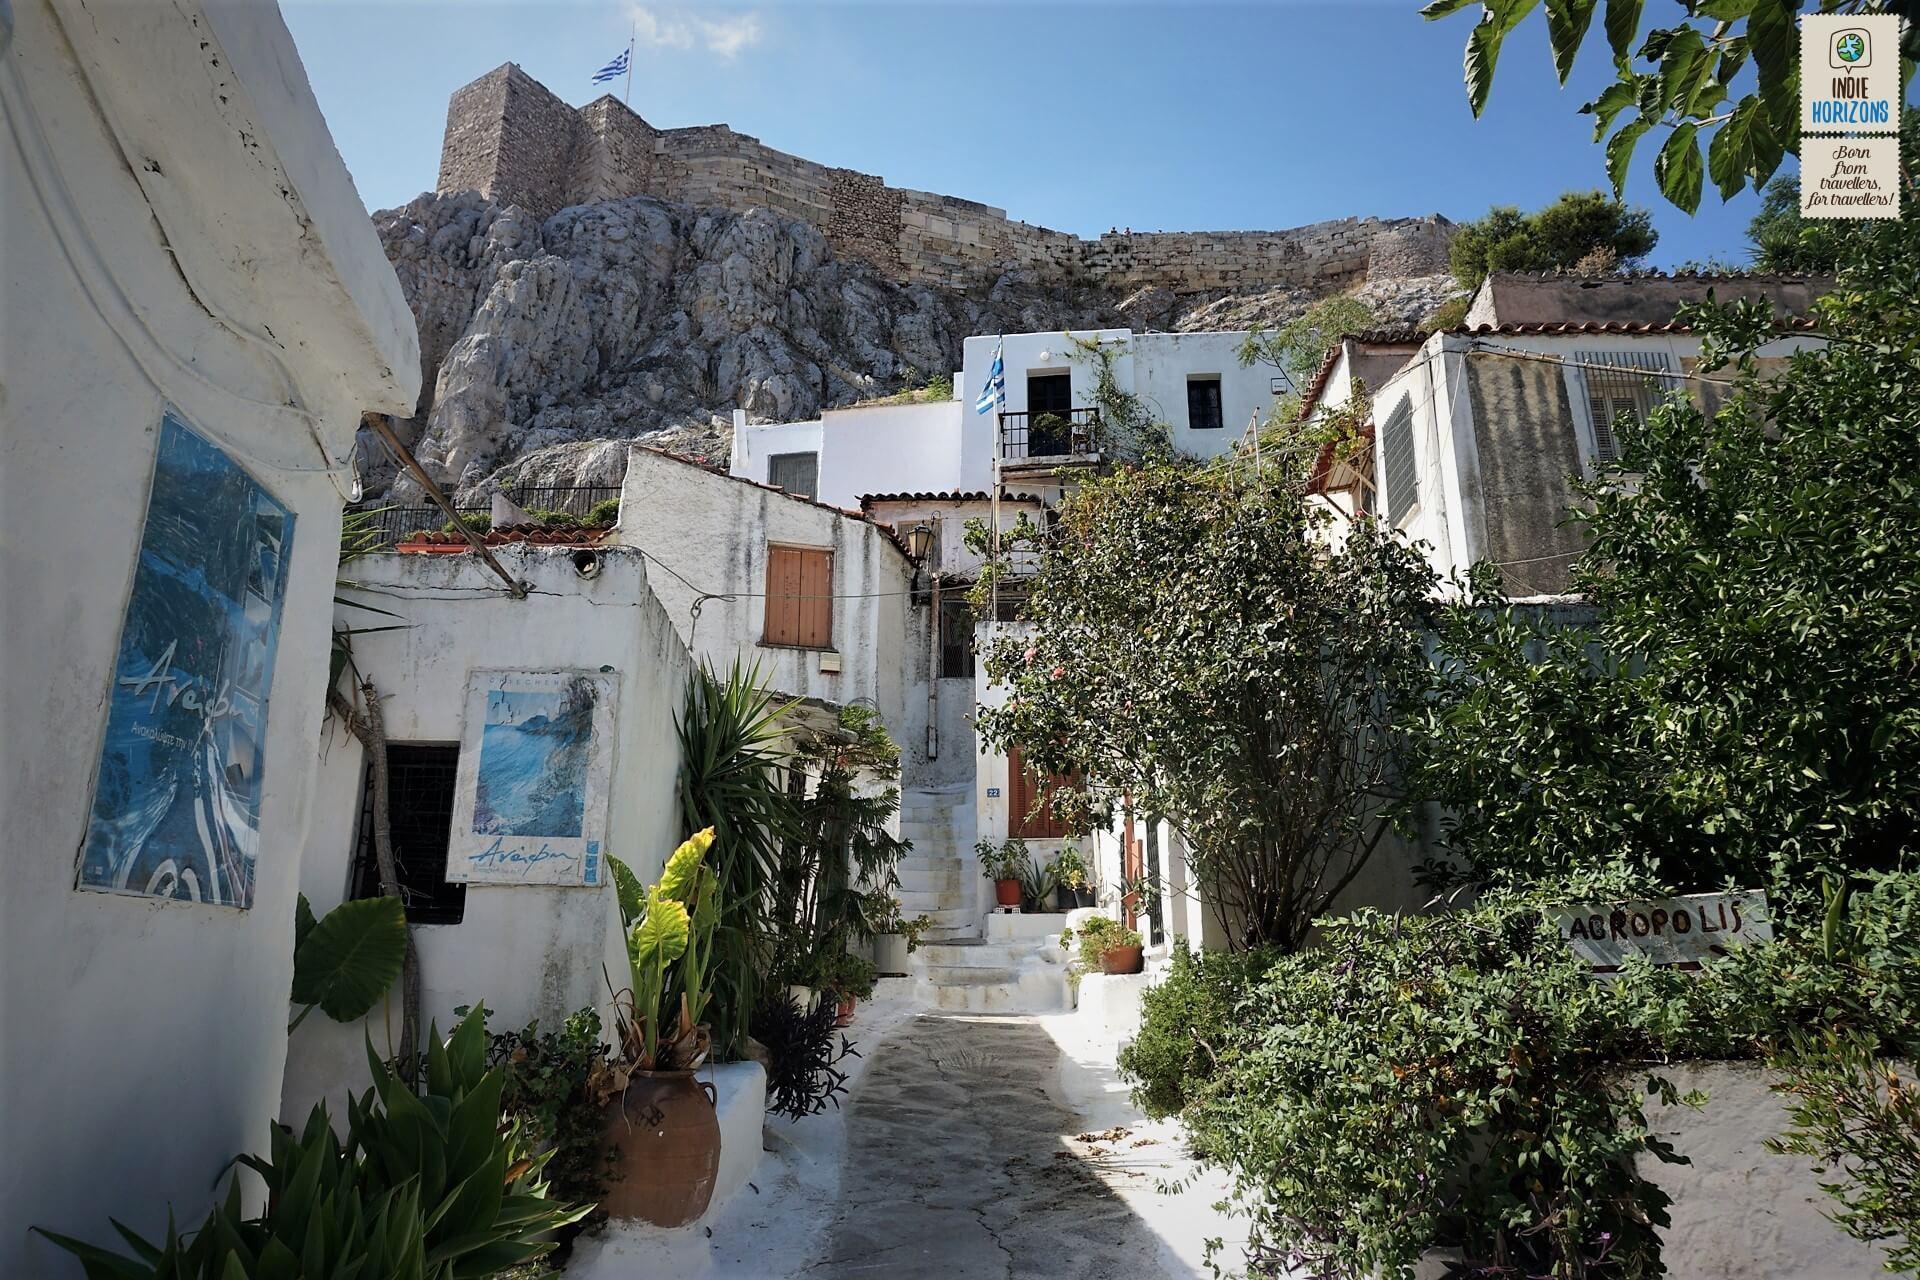 Athens, Anafiotika